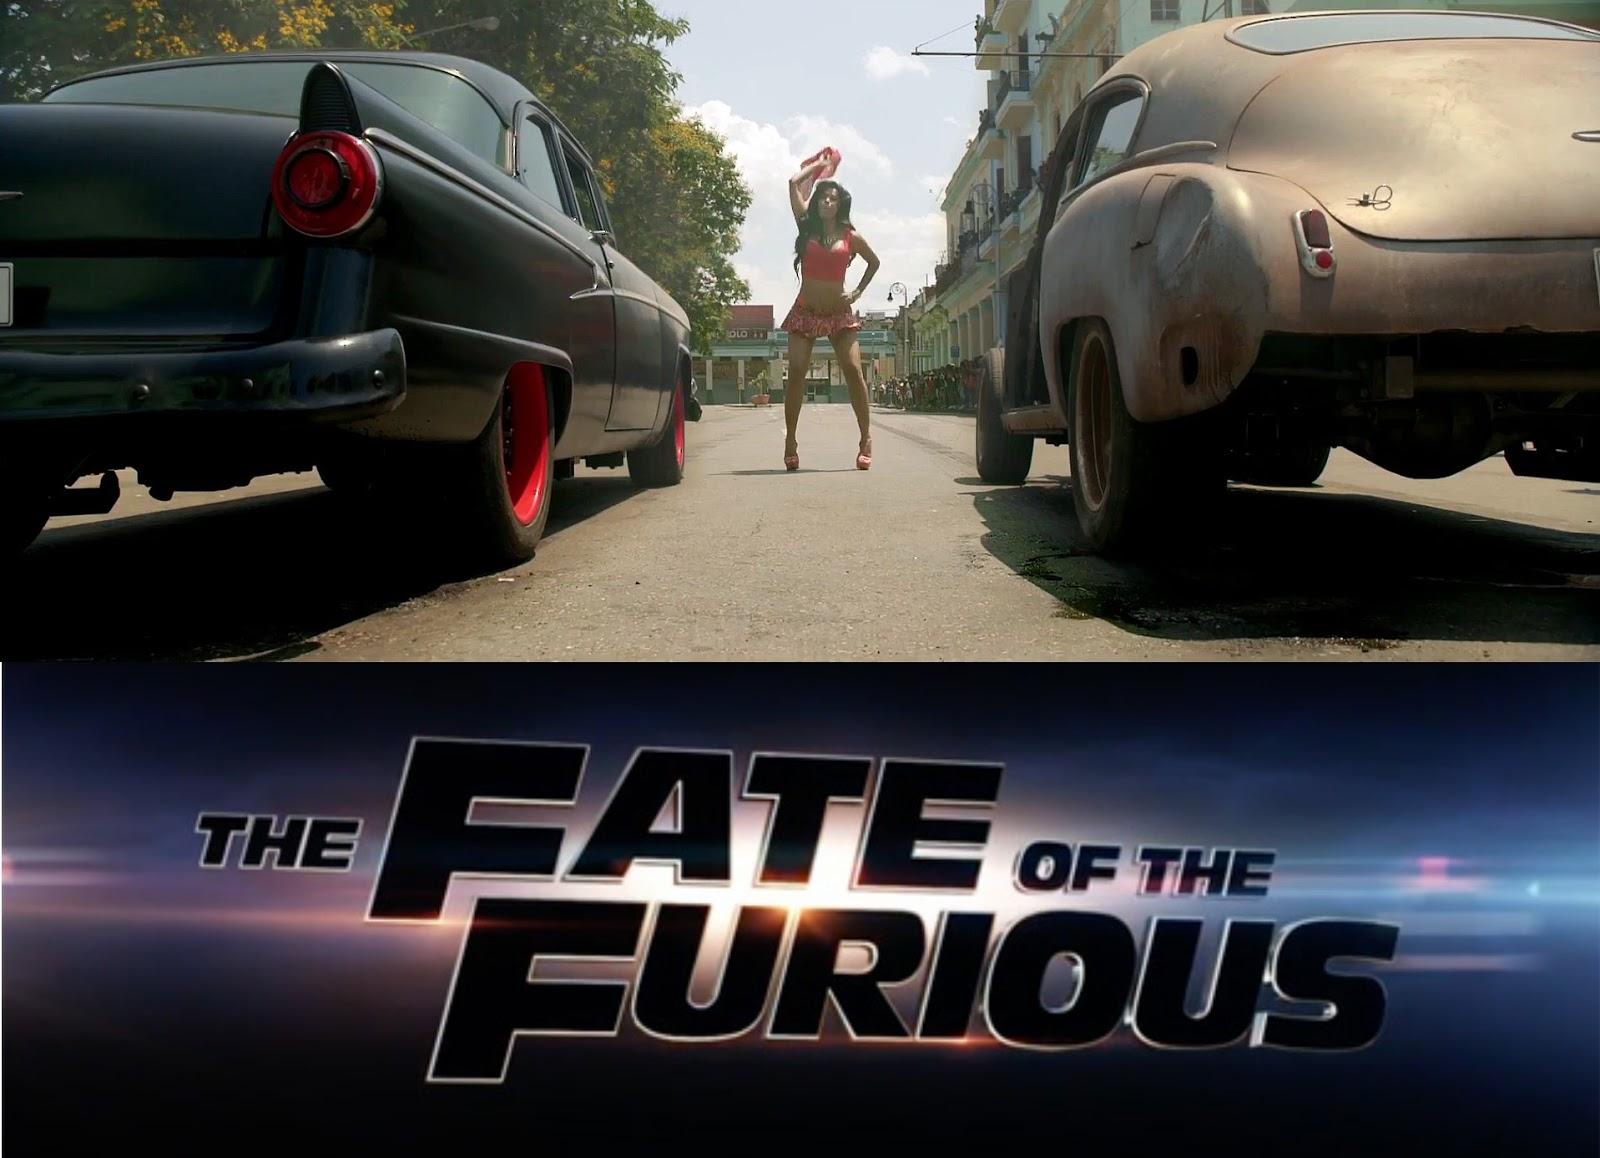 0 Fast and Furious 8 Οι καλύτερες ταινίες με αυτοκίνητα για το 2017 car, cars, Fast & Furious, Fun, Hollywood, movie cars, petrol heads, videos